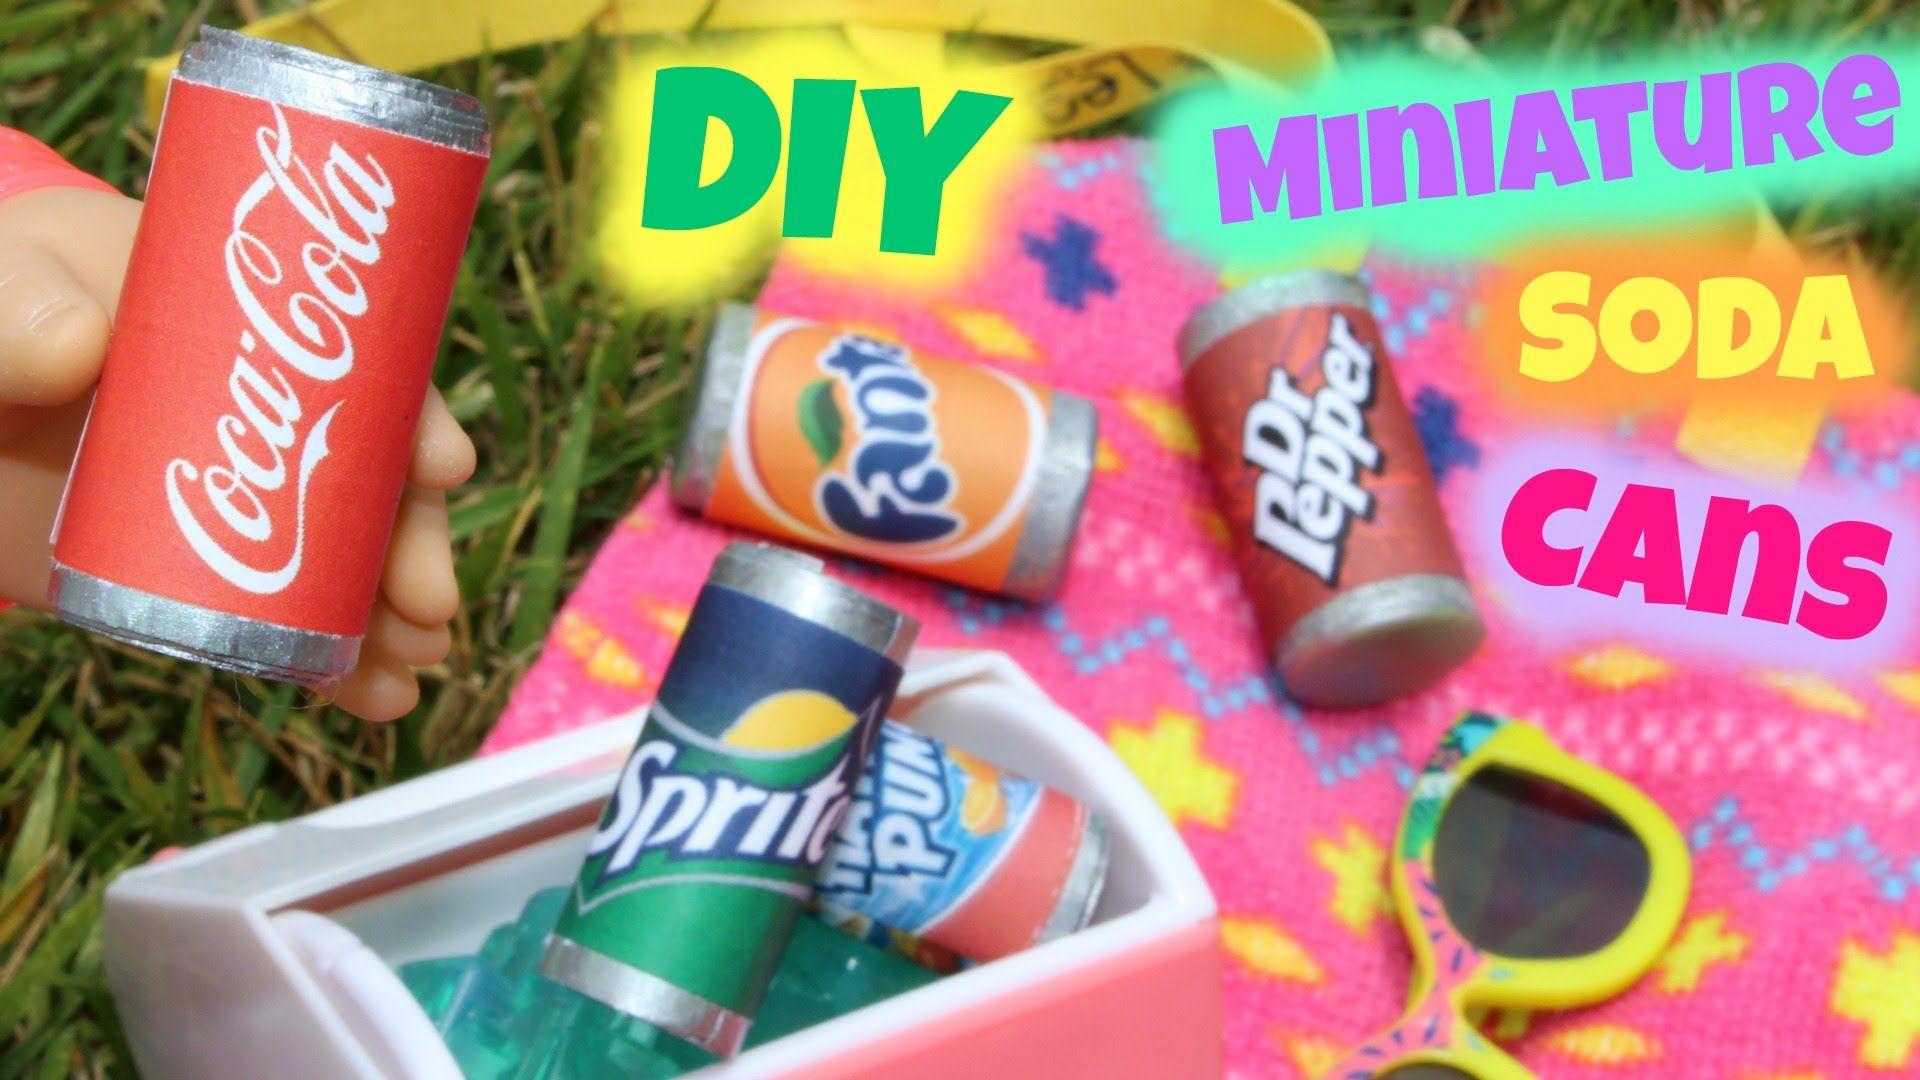 Diy american girl doll soda pop diy american girl crafts for Easy american girl doll crafts